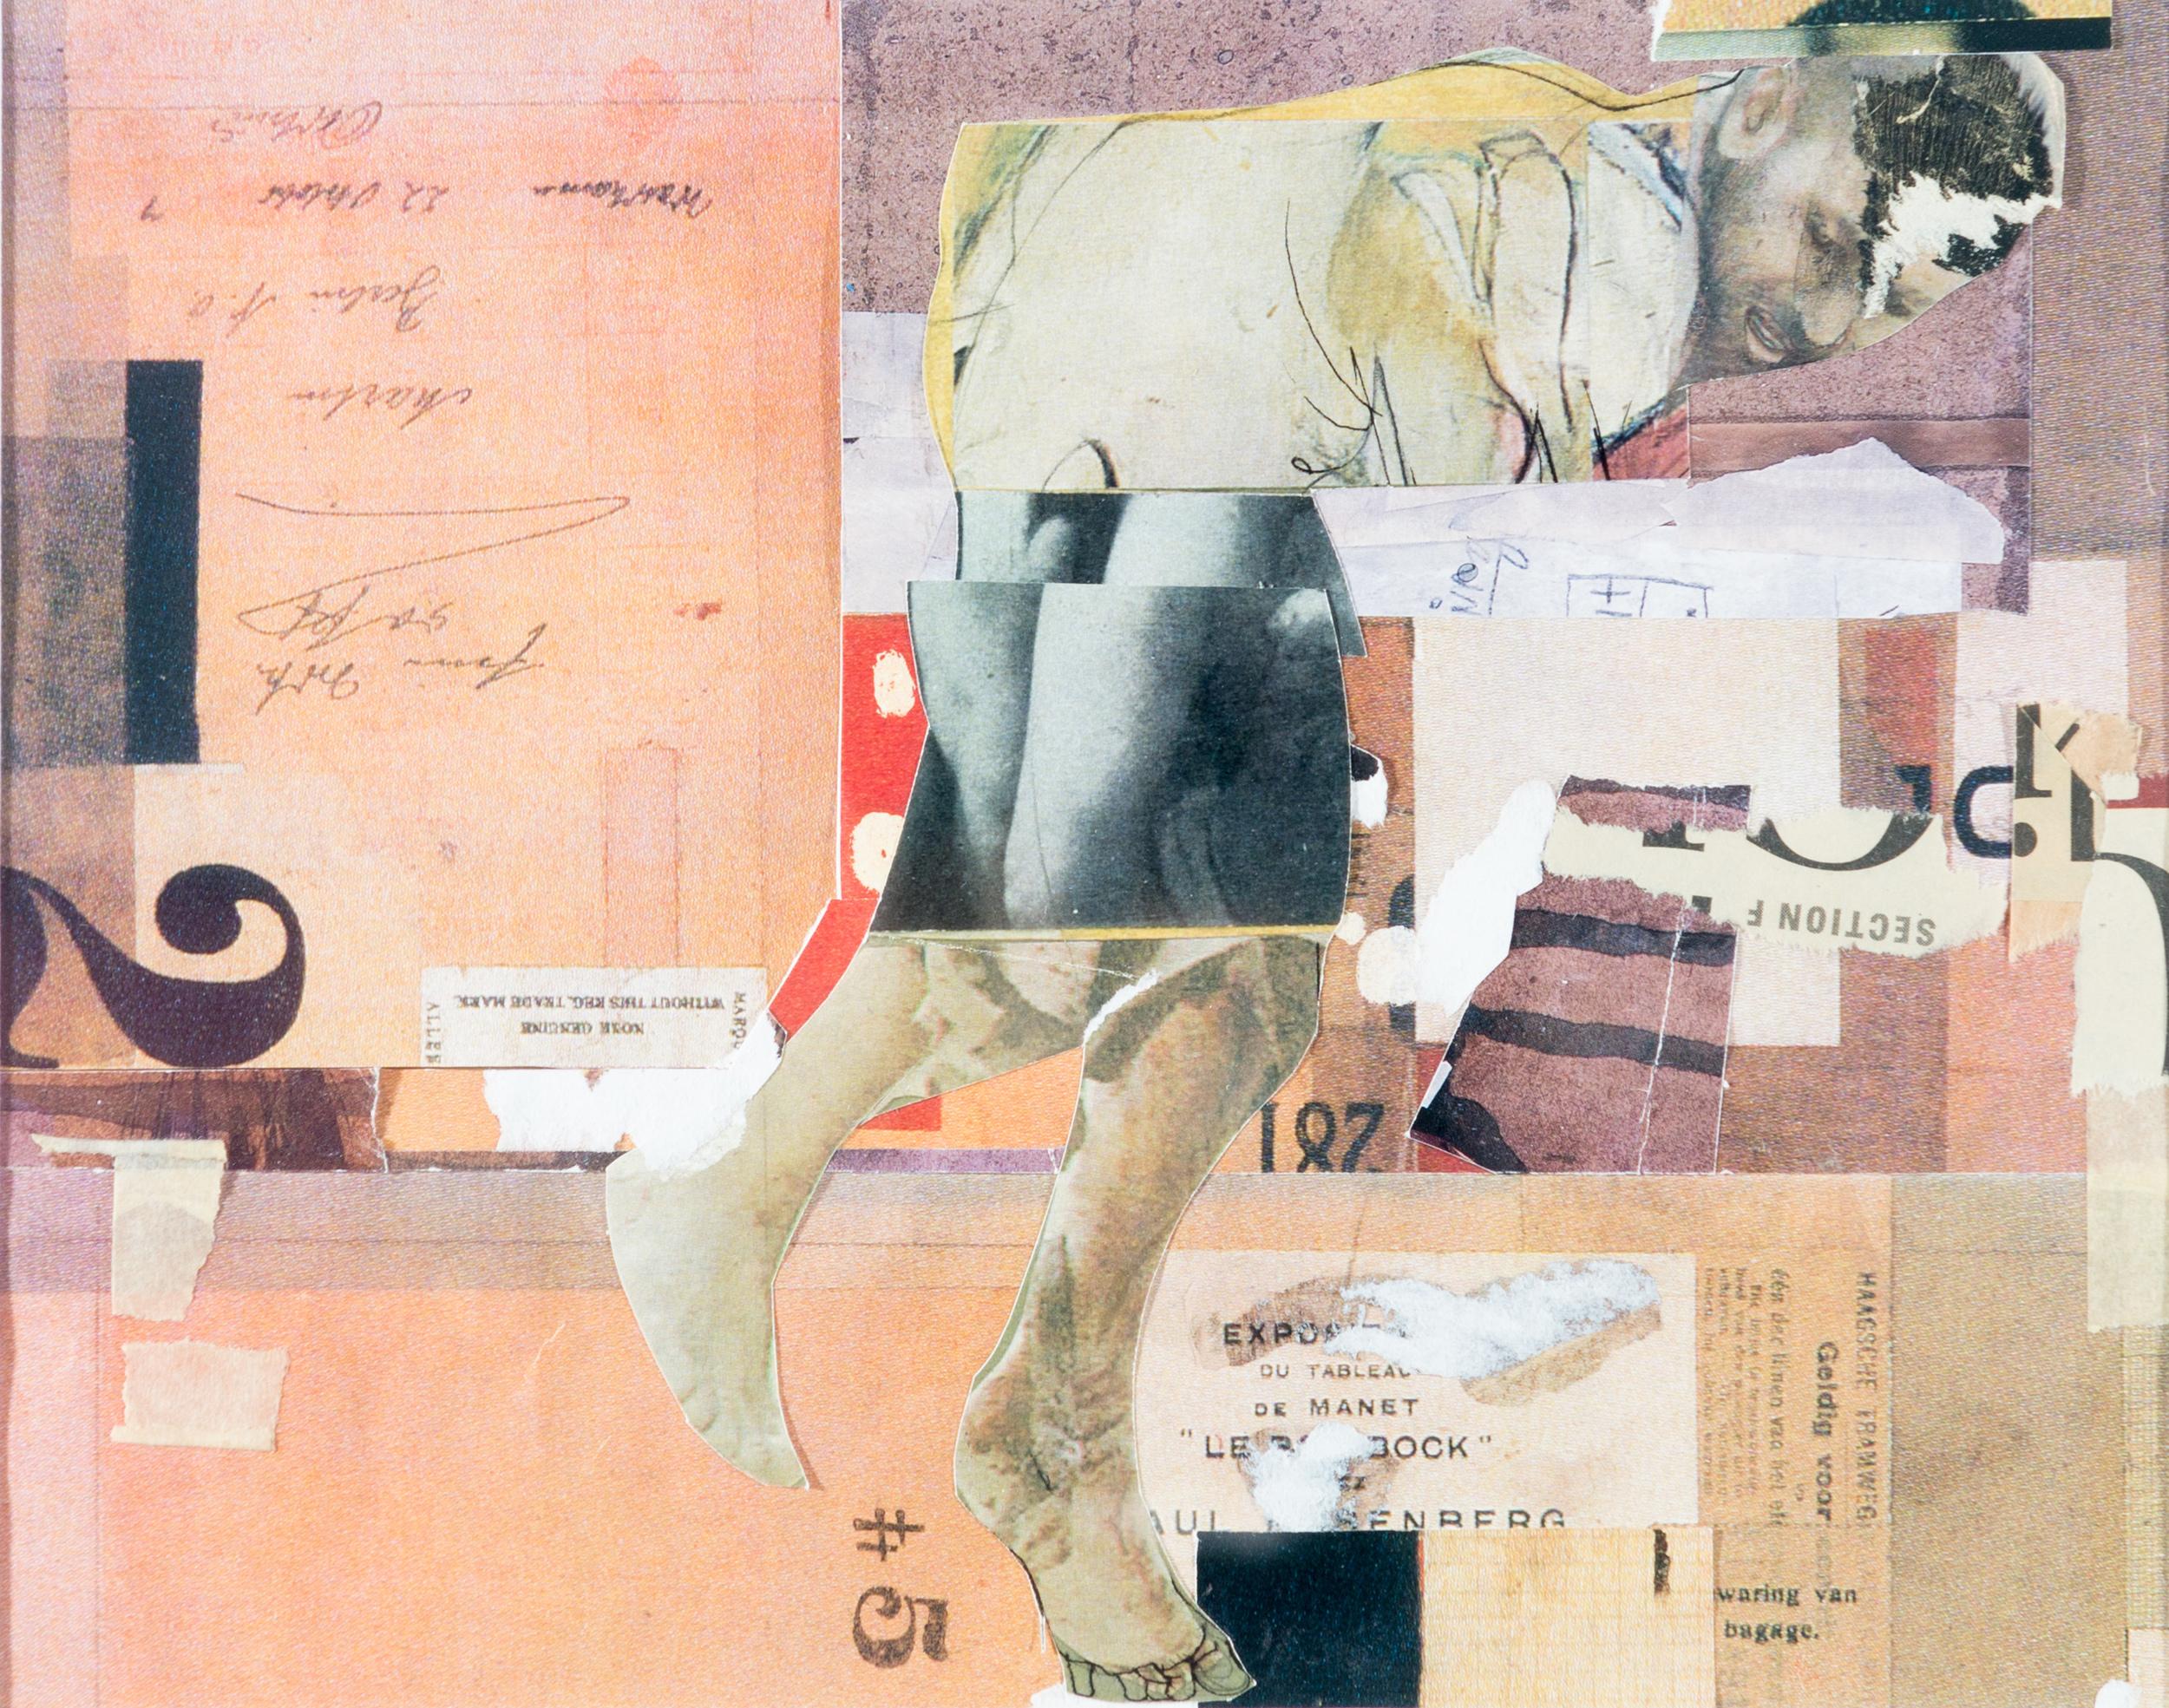 TL-045, Self portrait flying backwards, coloured pencil and ink on toned paper, 16.75 x 12.75 (framed), 2015, $375